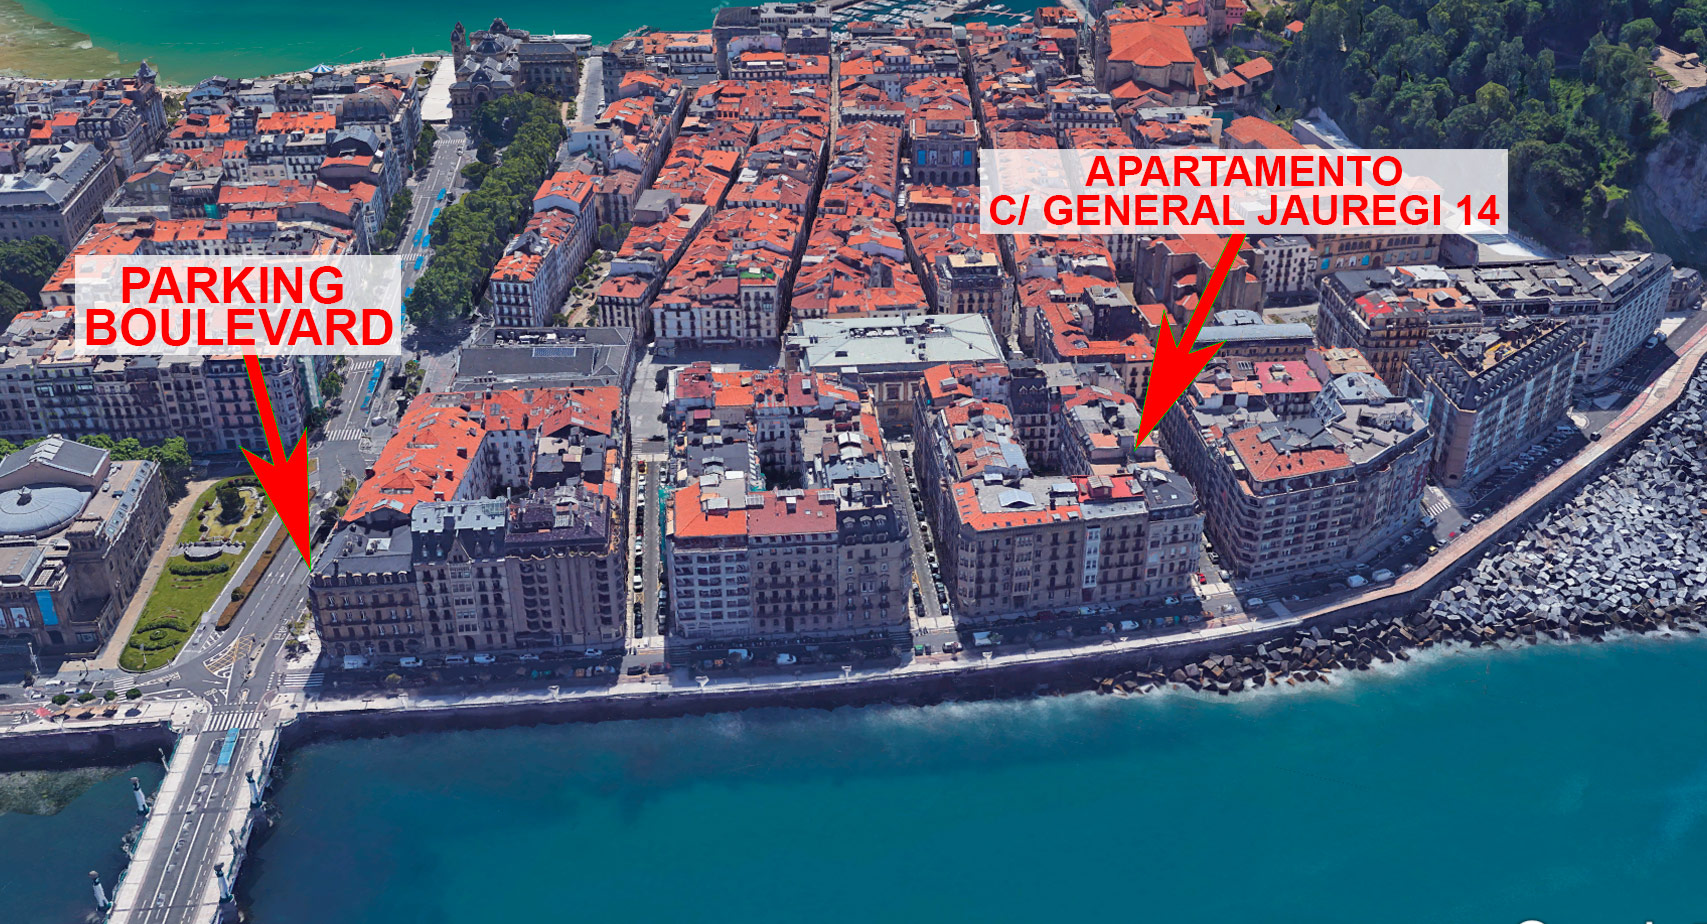 parking boulevard y apartamento en la calle general jauregi blog iberorent apartments san. Black Bedroom Furniture Sets. Home Design Ideas